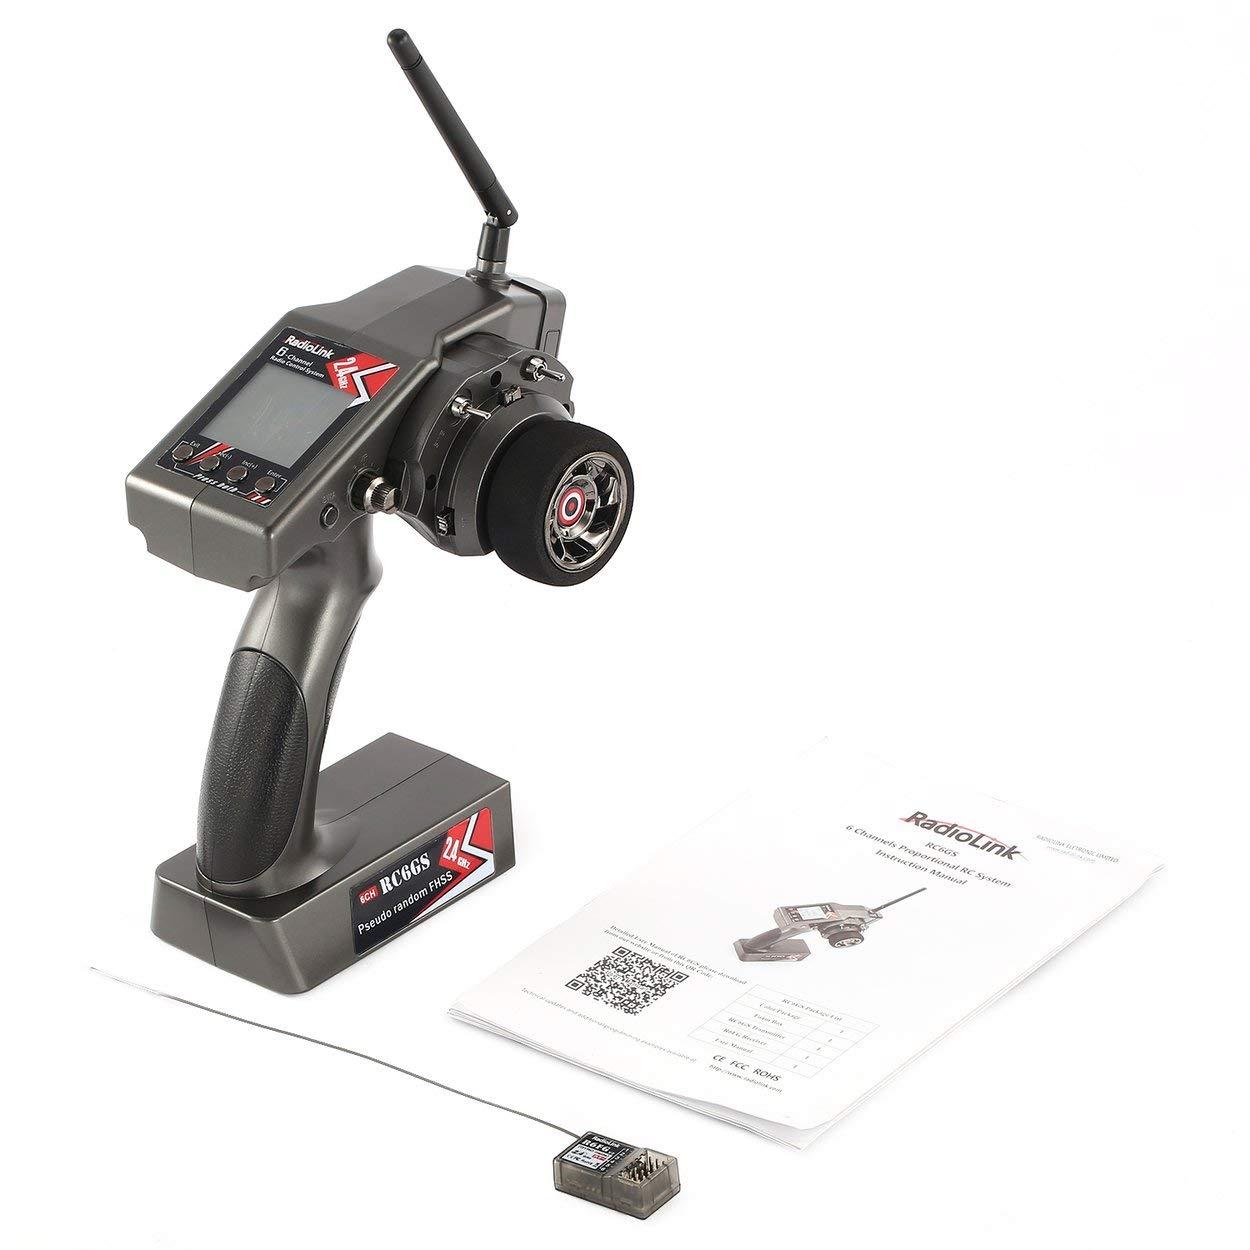 Lorenlli RadioLink RC6GS 2,4 GHz 6CH 400 Mt Fernbedienung Sender + R6FG Gyro Innerhalb Empfänger Für RC Auto Stiefel